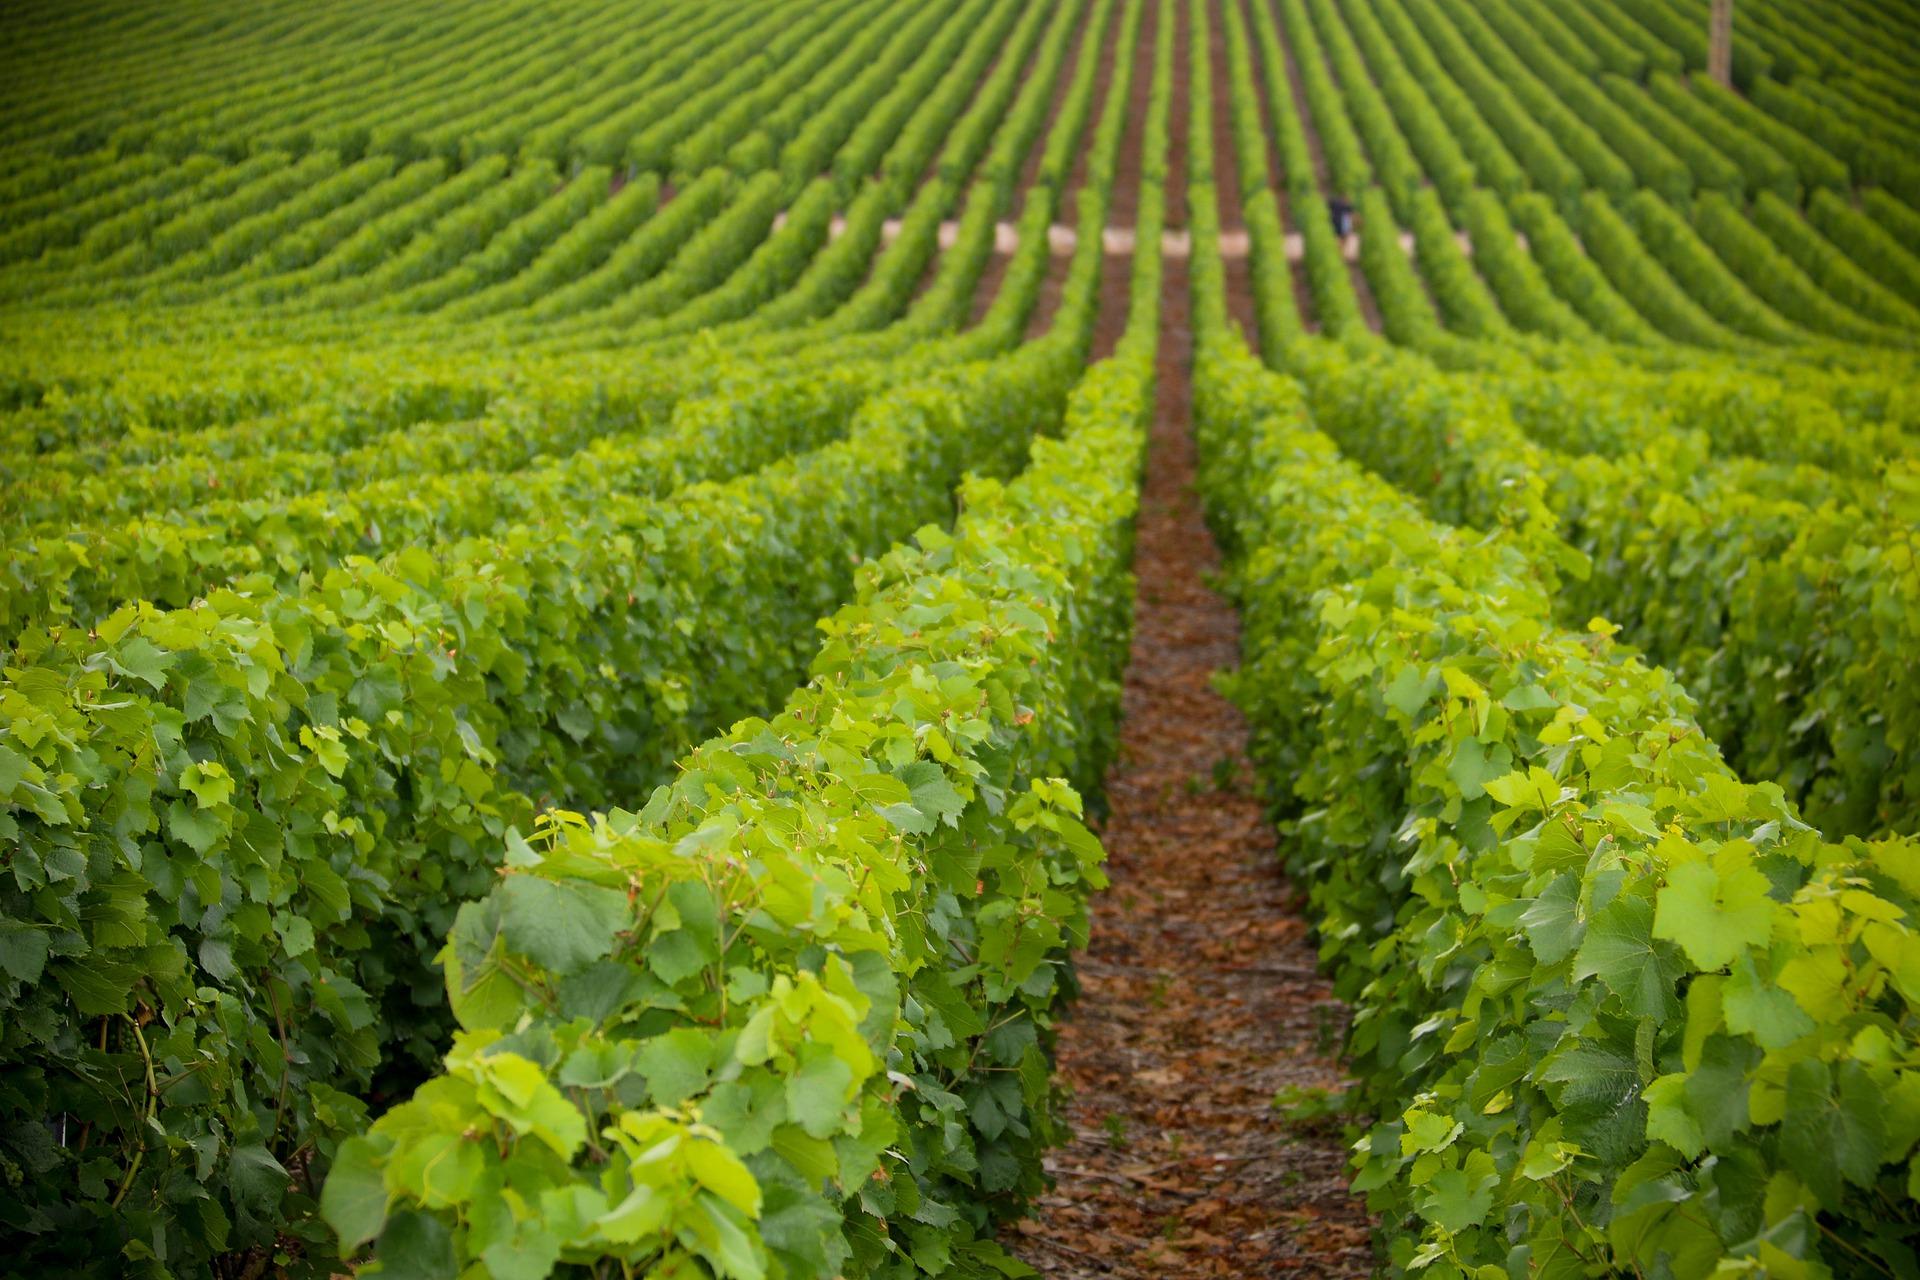 grape-plantation-5514588_1920